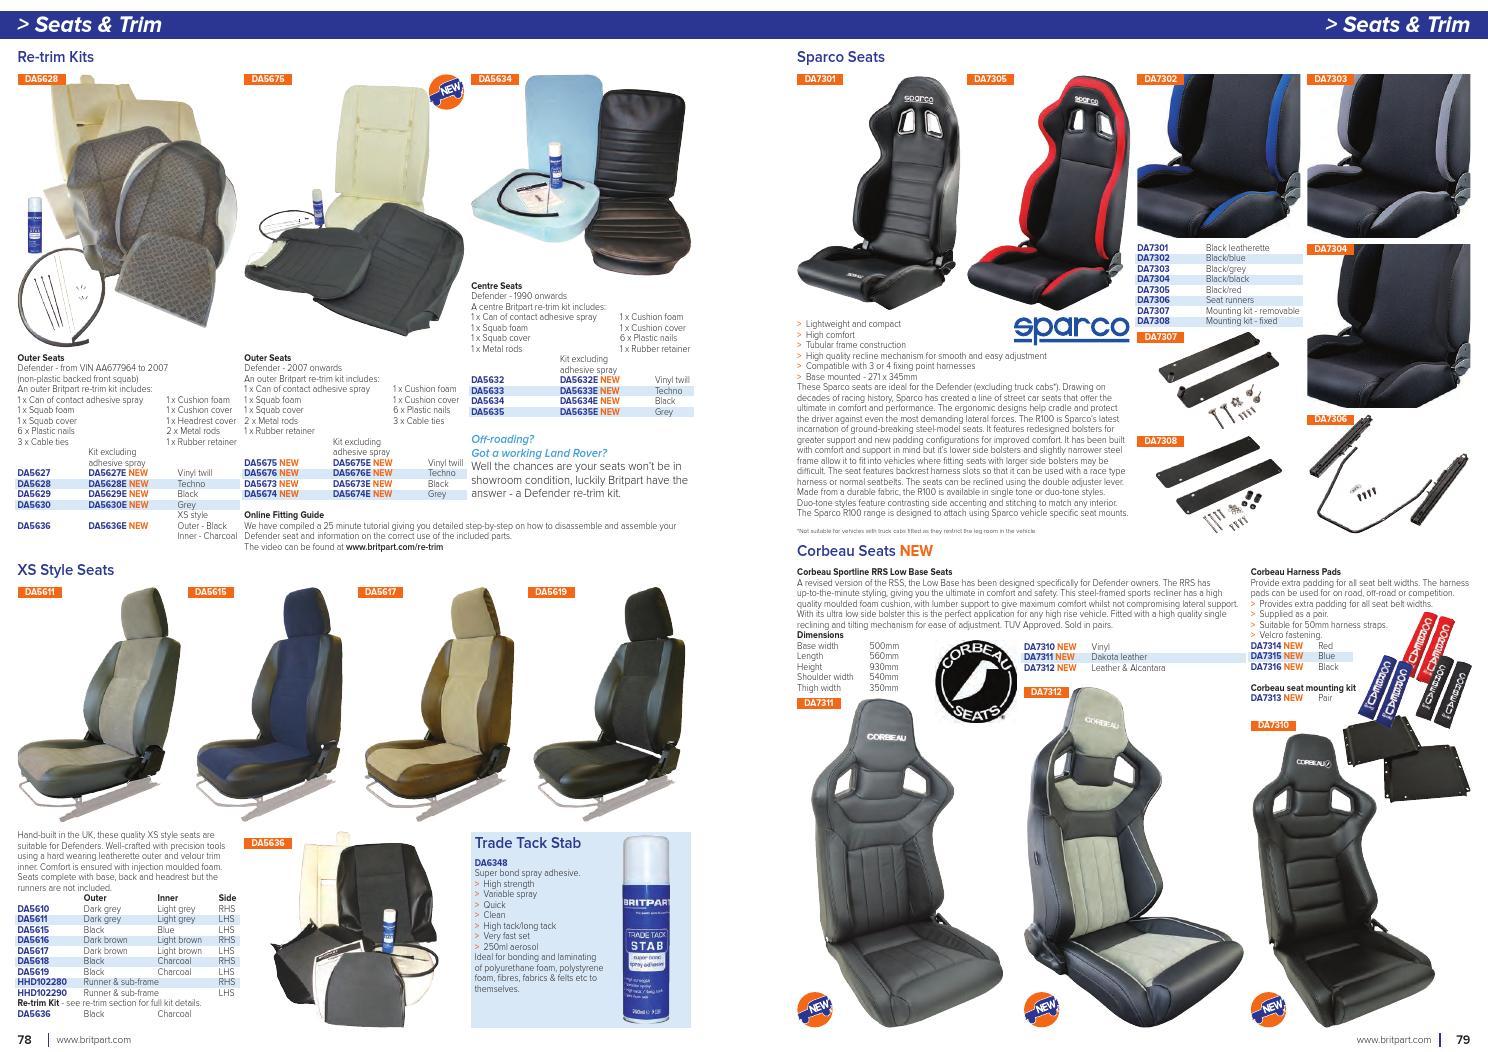 Black Corbeau Harness Race Pad For All Seat Belts /& 50mm Race Harness Straps